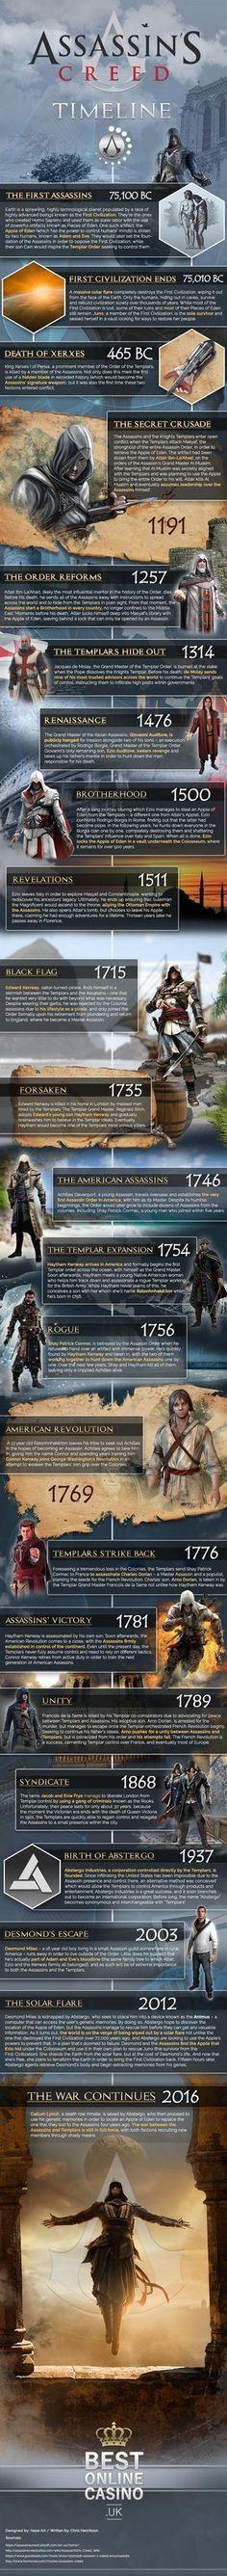 #assassins #assassinscreed #history #assassinscreedgame #assassinscreedtimeline